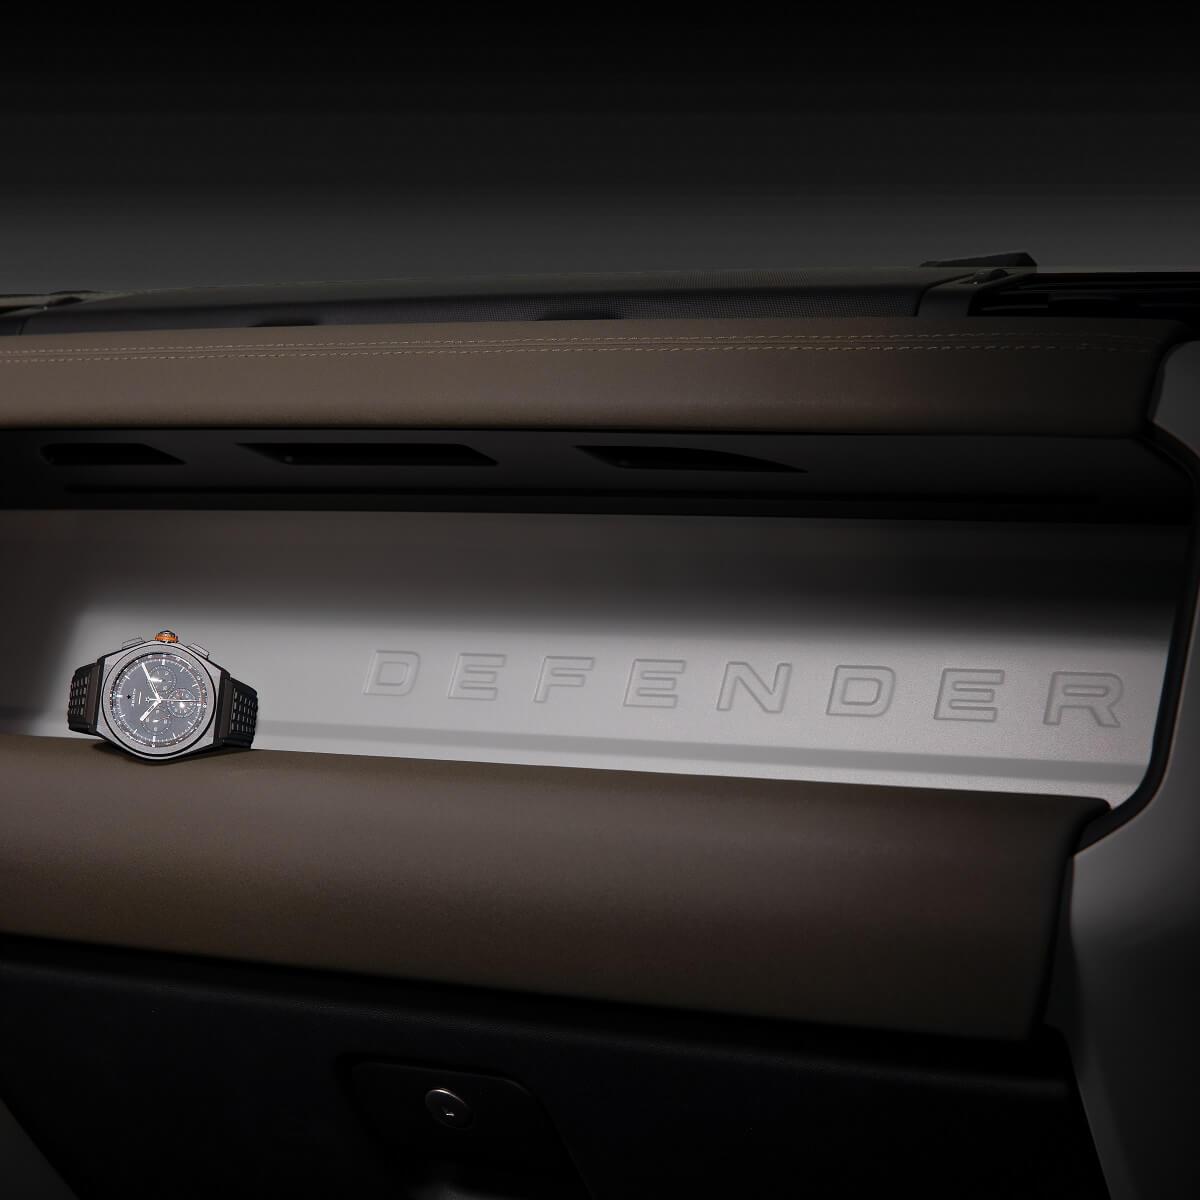 Land-Rover-Zenith-Defy-21-6.jpg